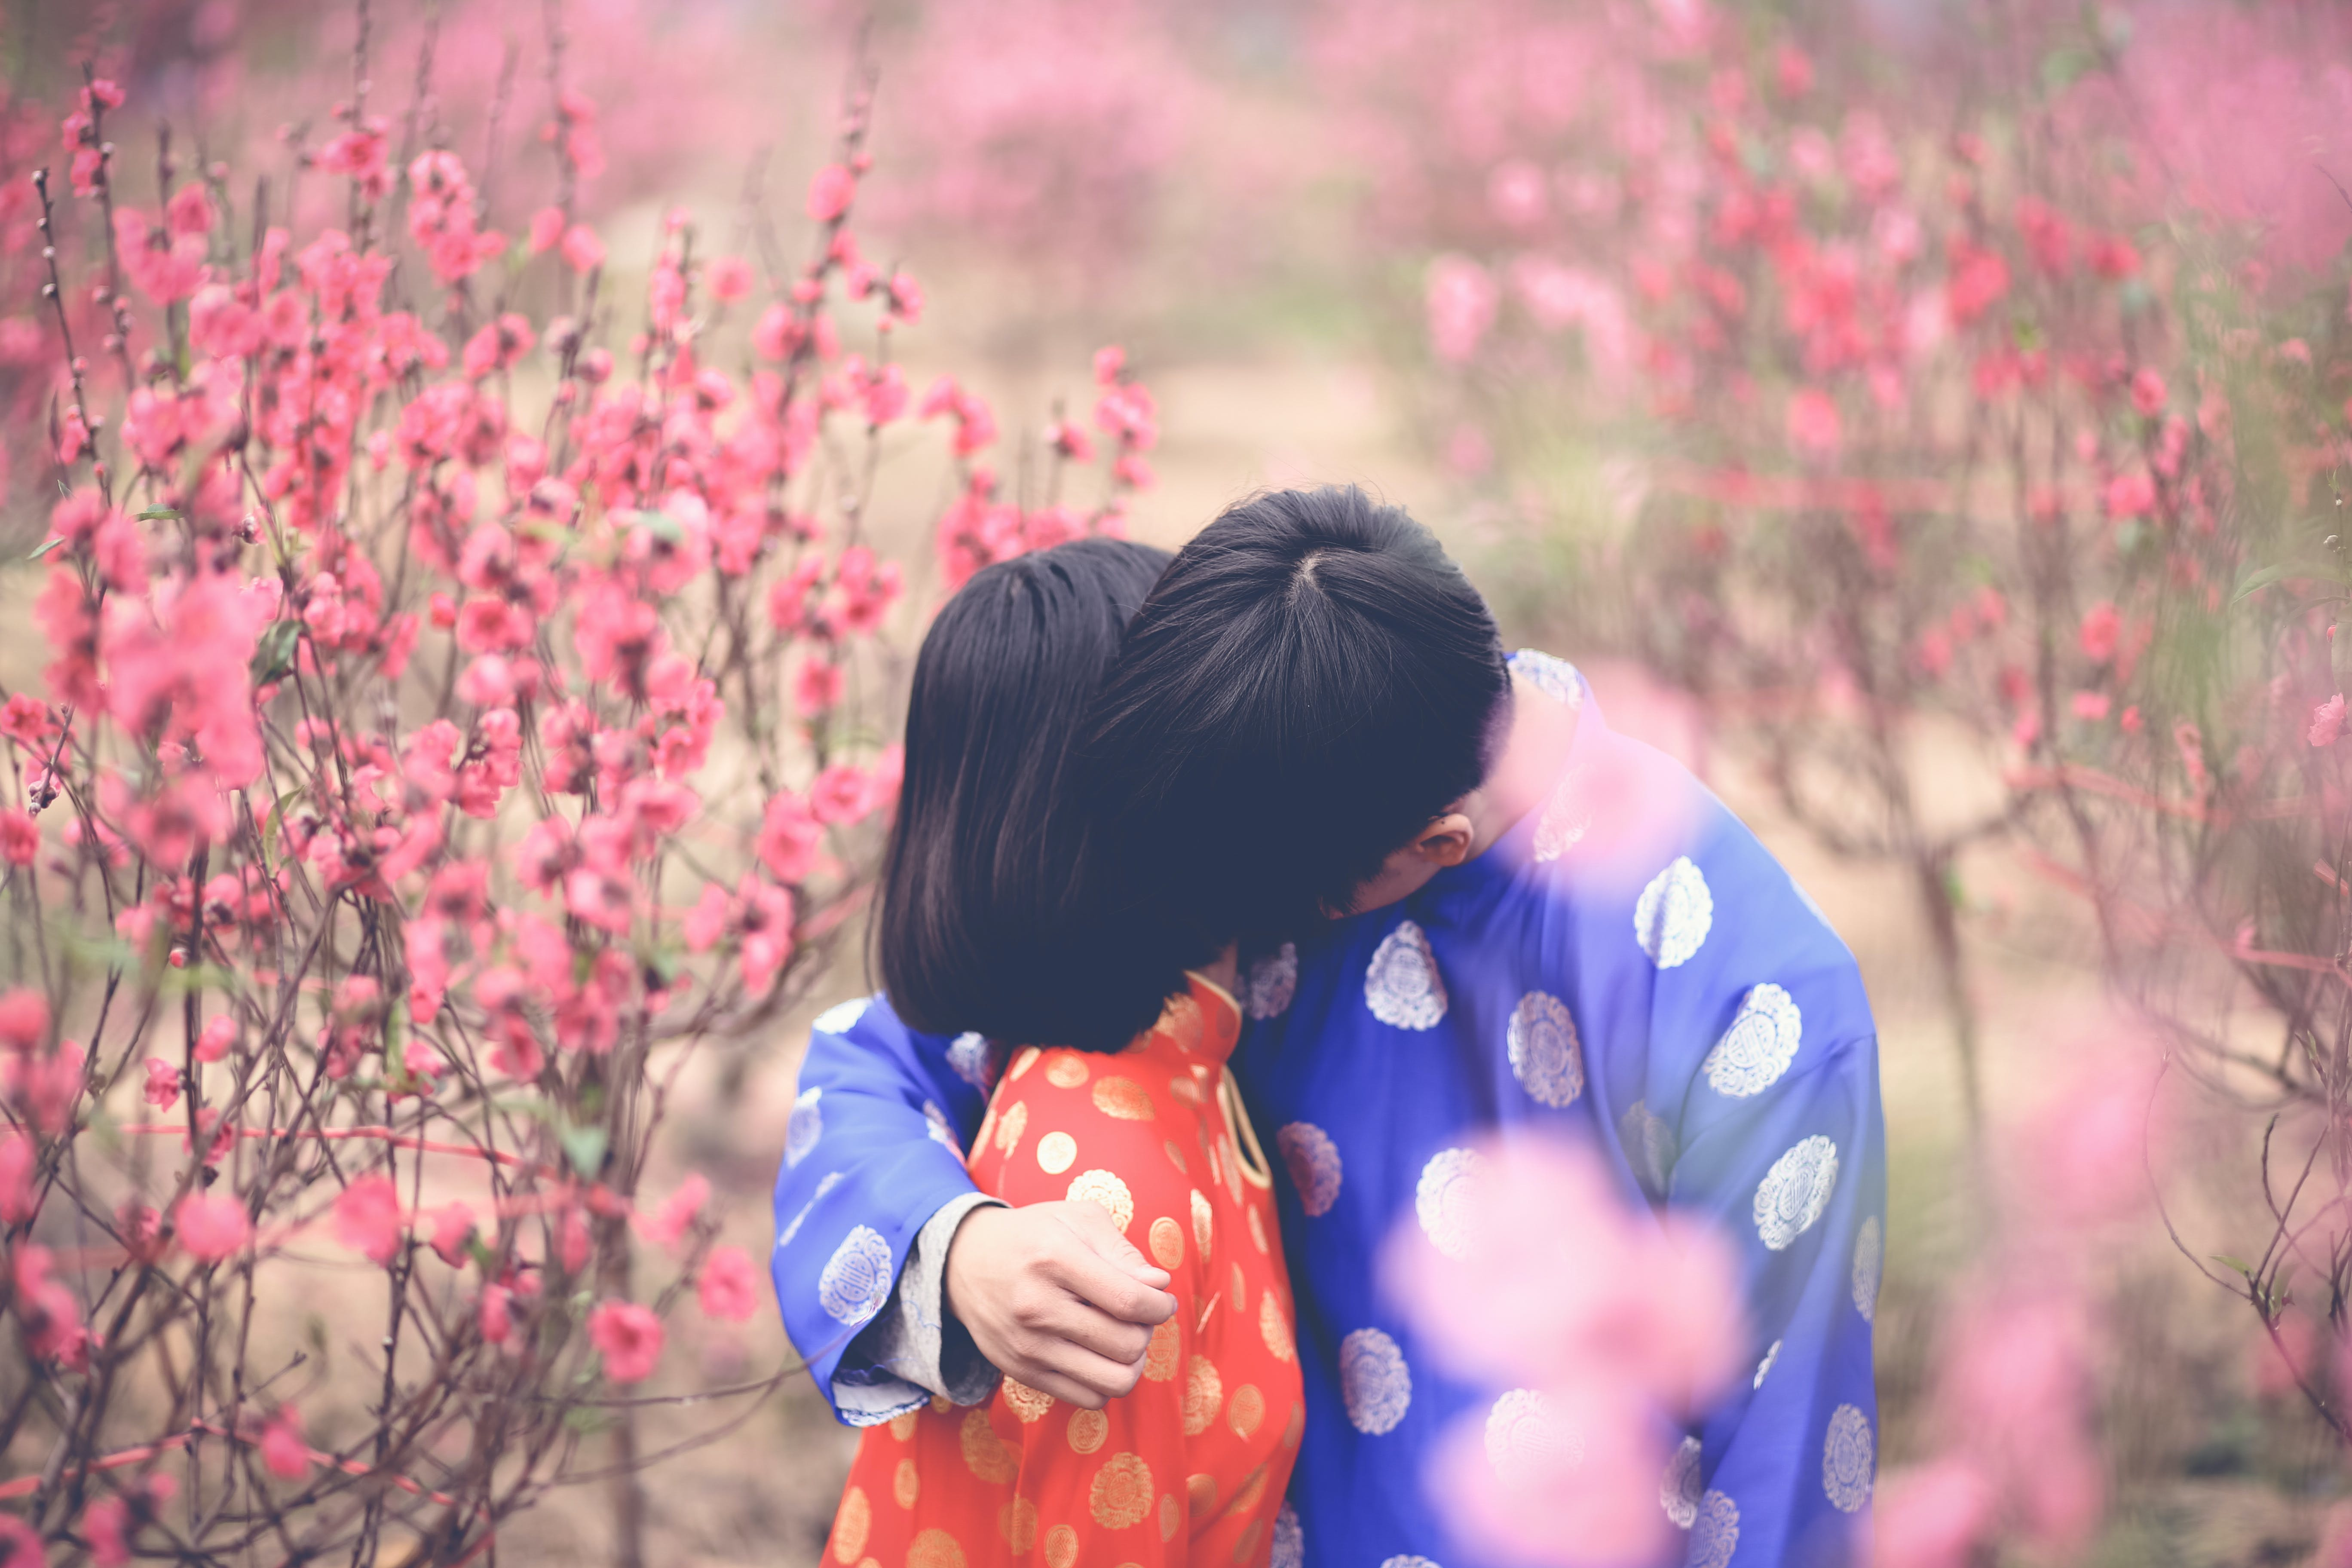 Man Hugging Girl in Orange Clothes